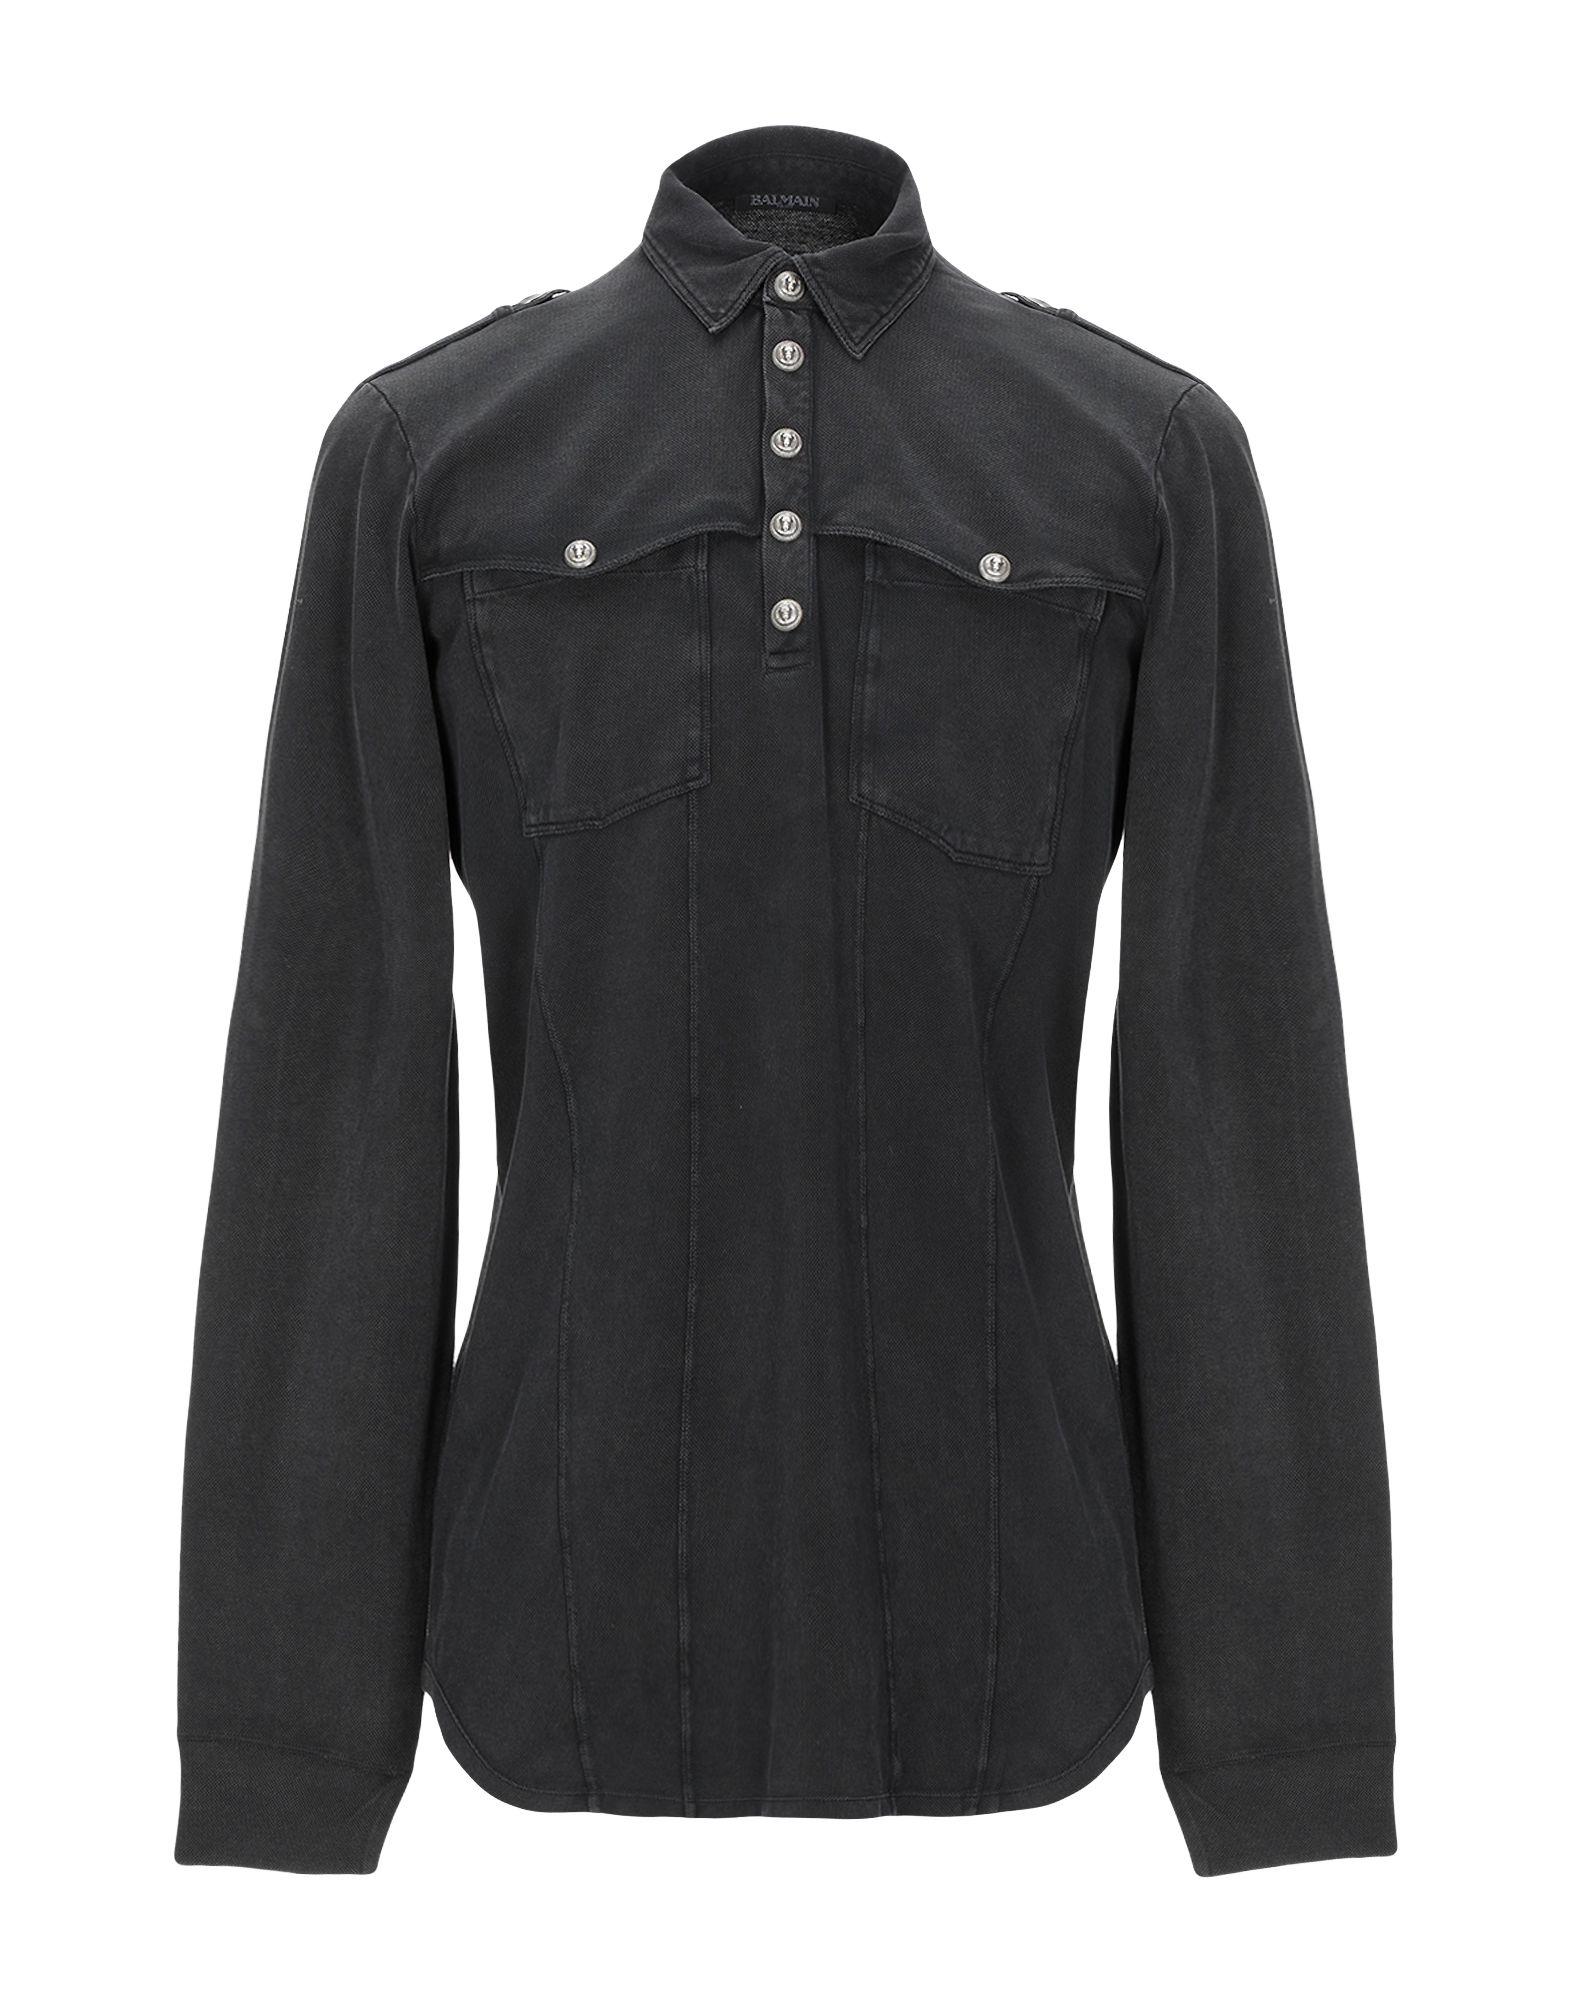 BALMAIN Polo shirts. piqué, logo, contrasting applications, solid color, polo collar, long sleeves, front closure, snap button fastening, multipockets. 100% Cotton